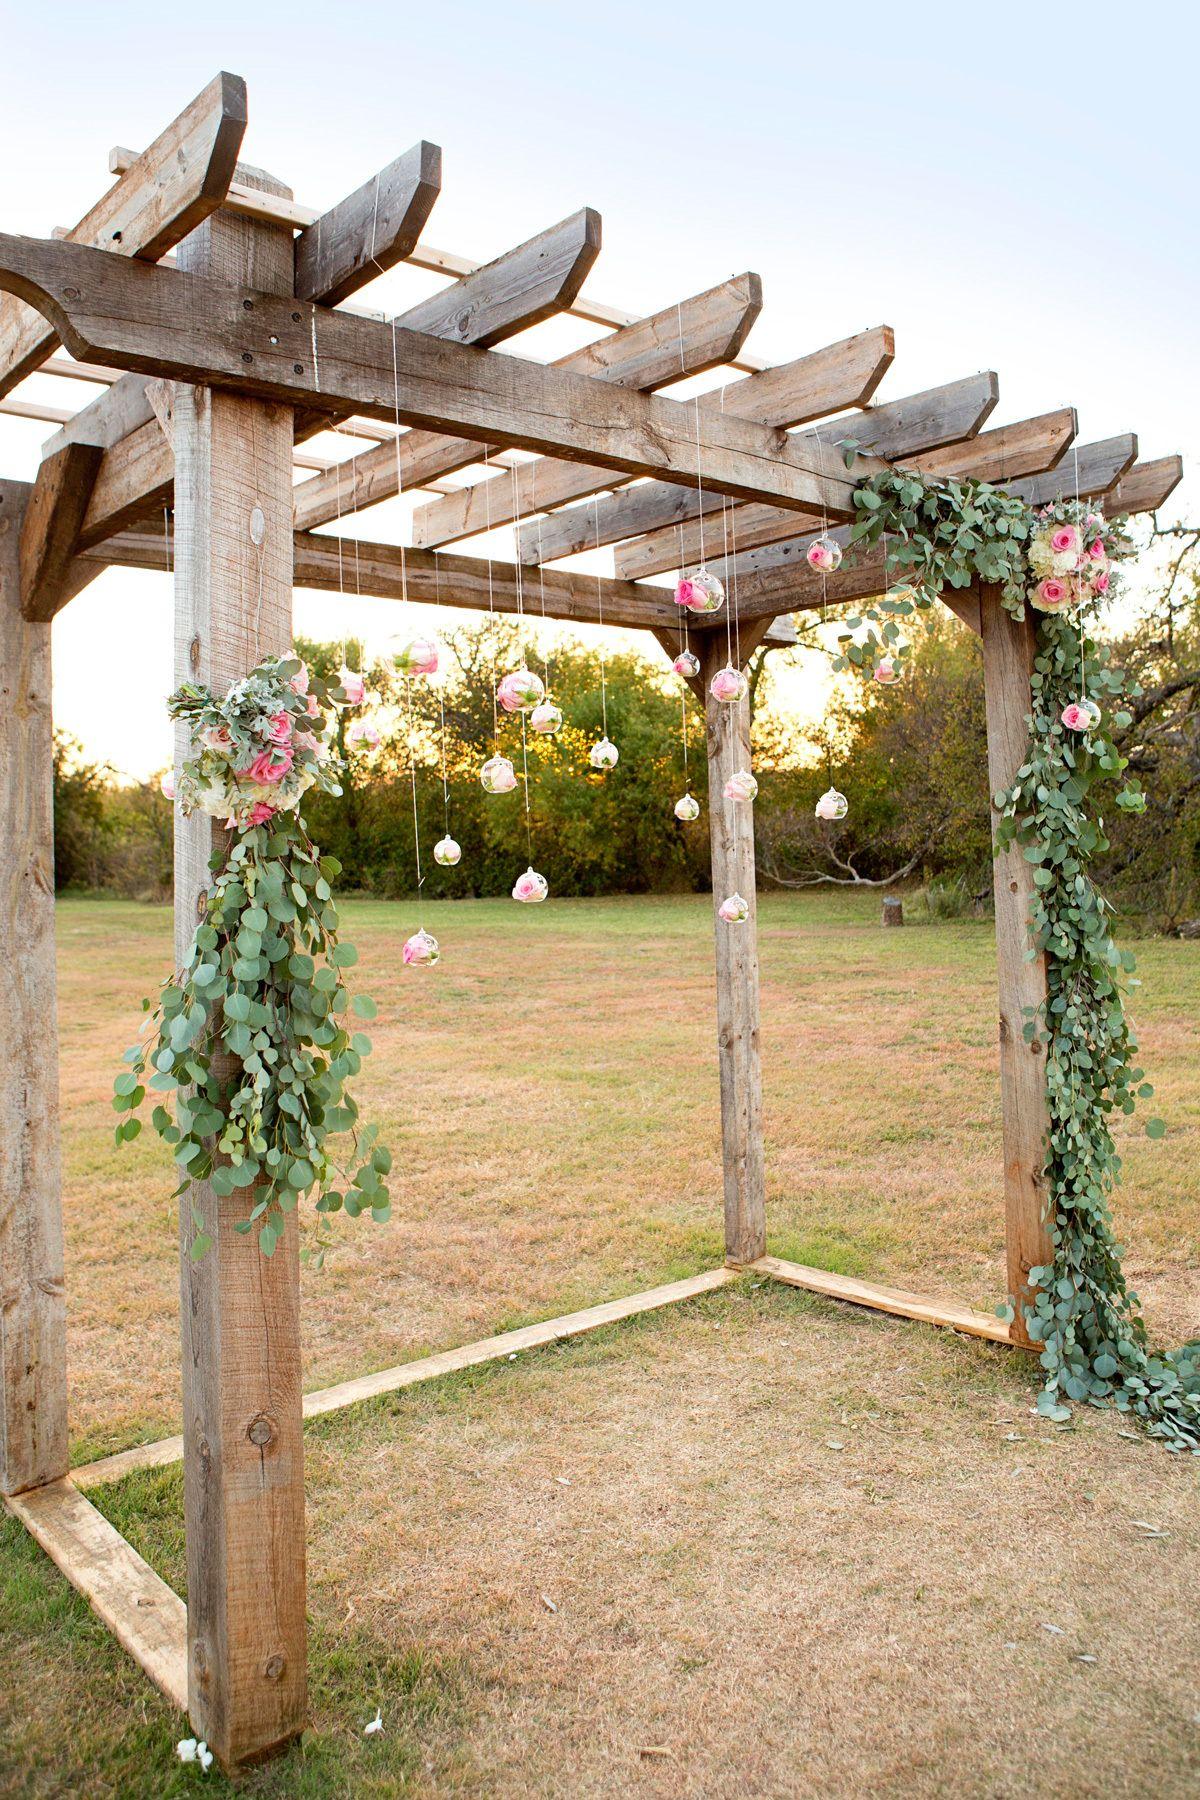 Diy Wedding Pergola With Flowers And Eucalyptus Hanging Globe